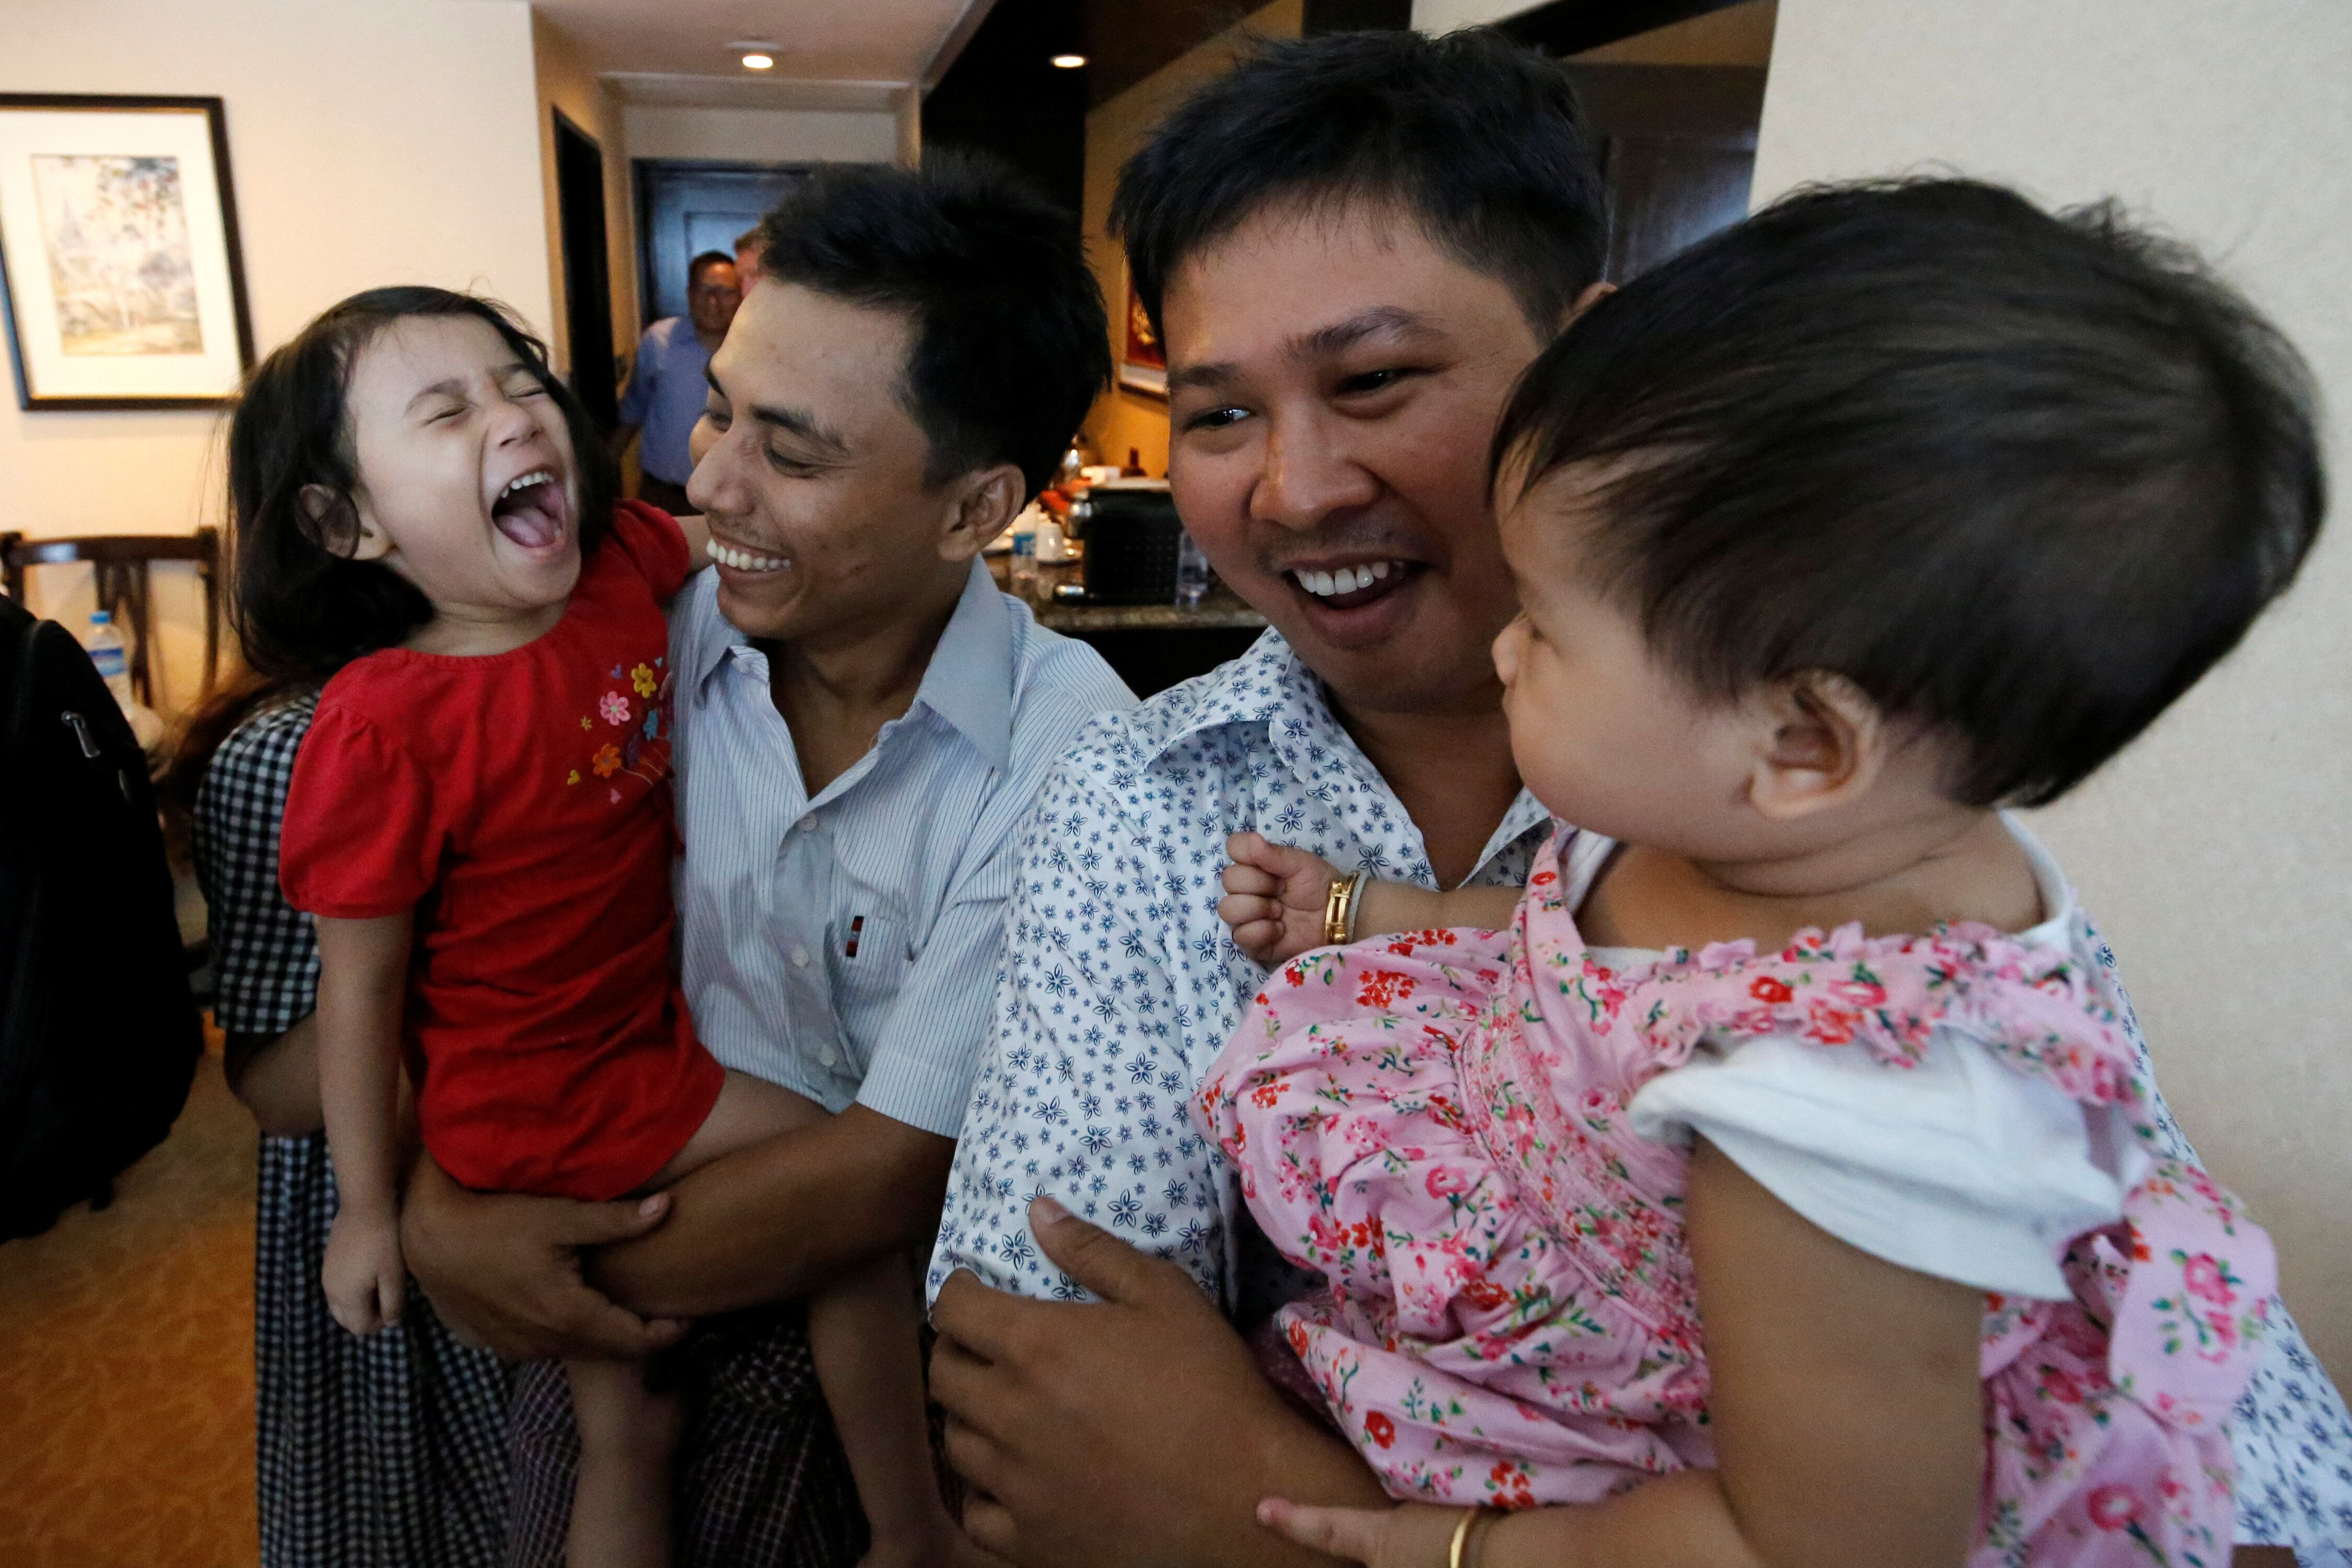 Birmania amnistía a dos reporteros de Reuters que revelaron una matanza de